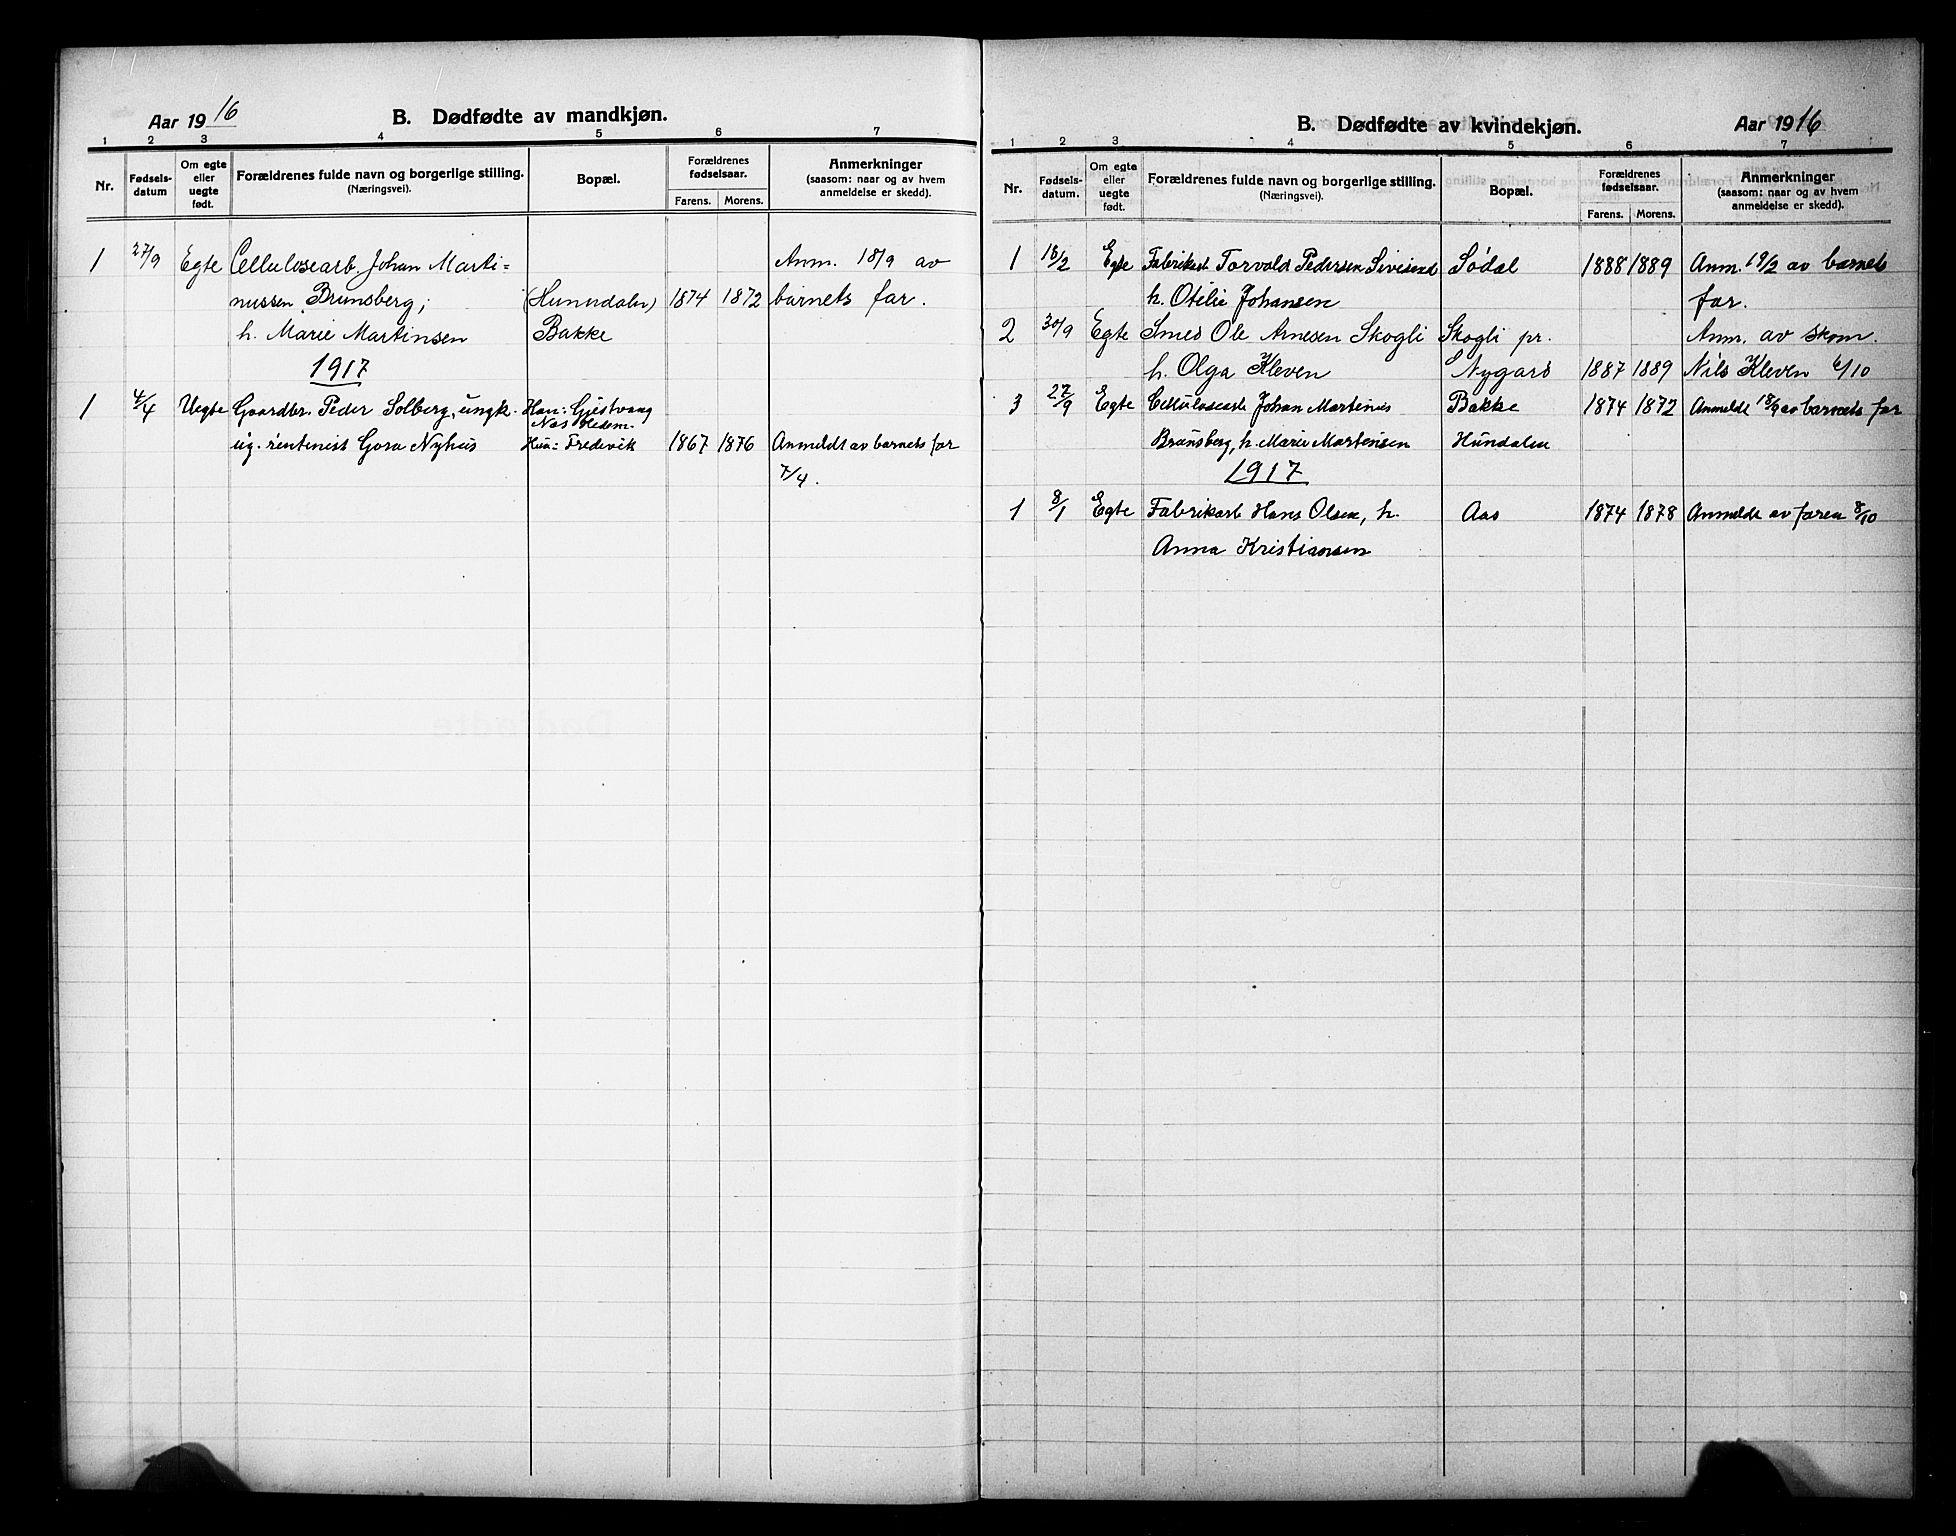 SAH, Vardal prestekontor, H/Ha/Hab/L0016: Klokkerbok nr. 16, 1915-1929